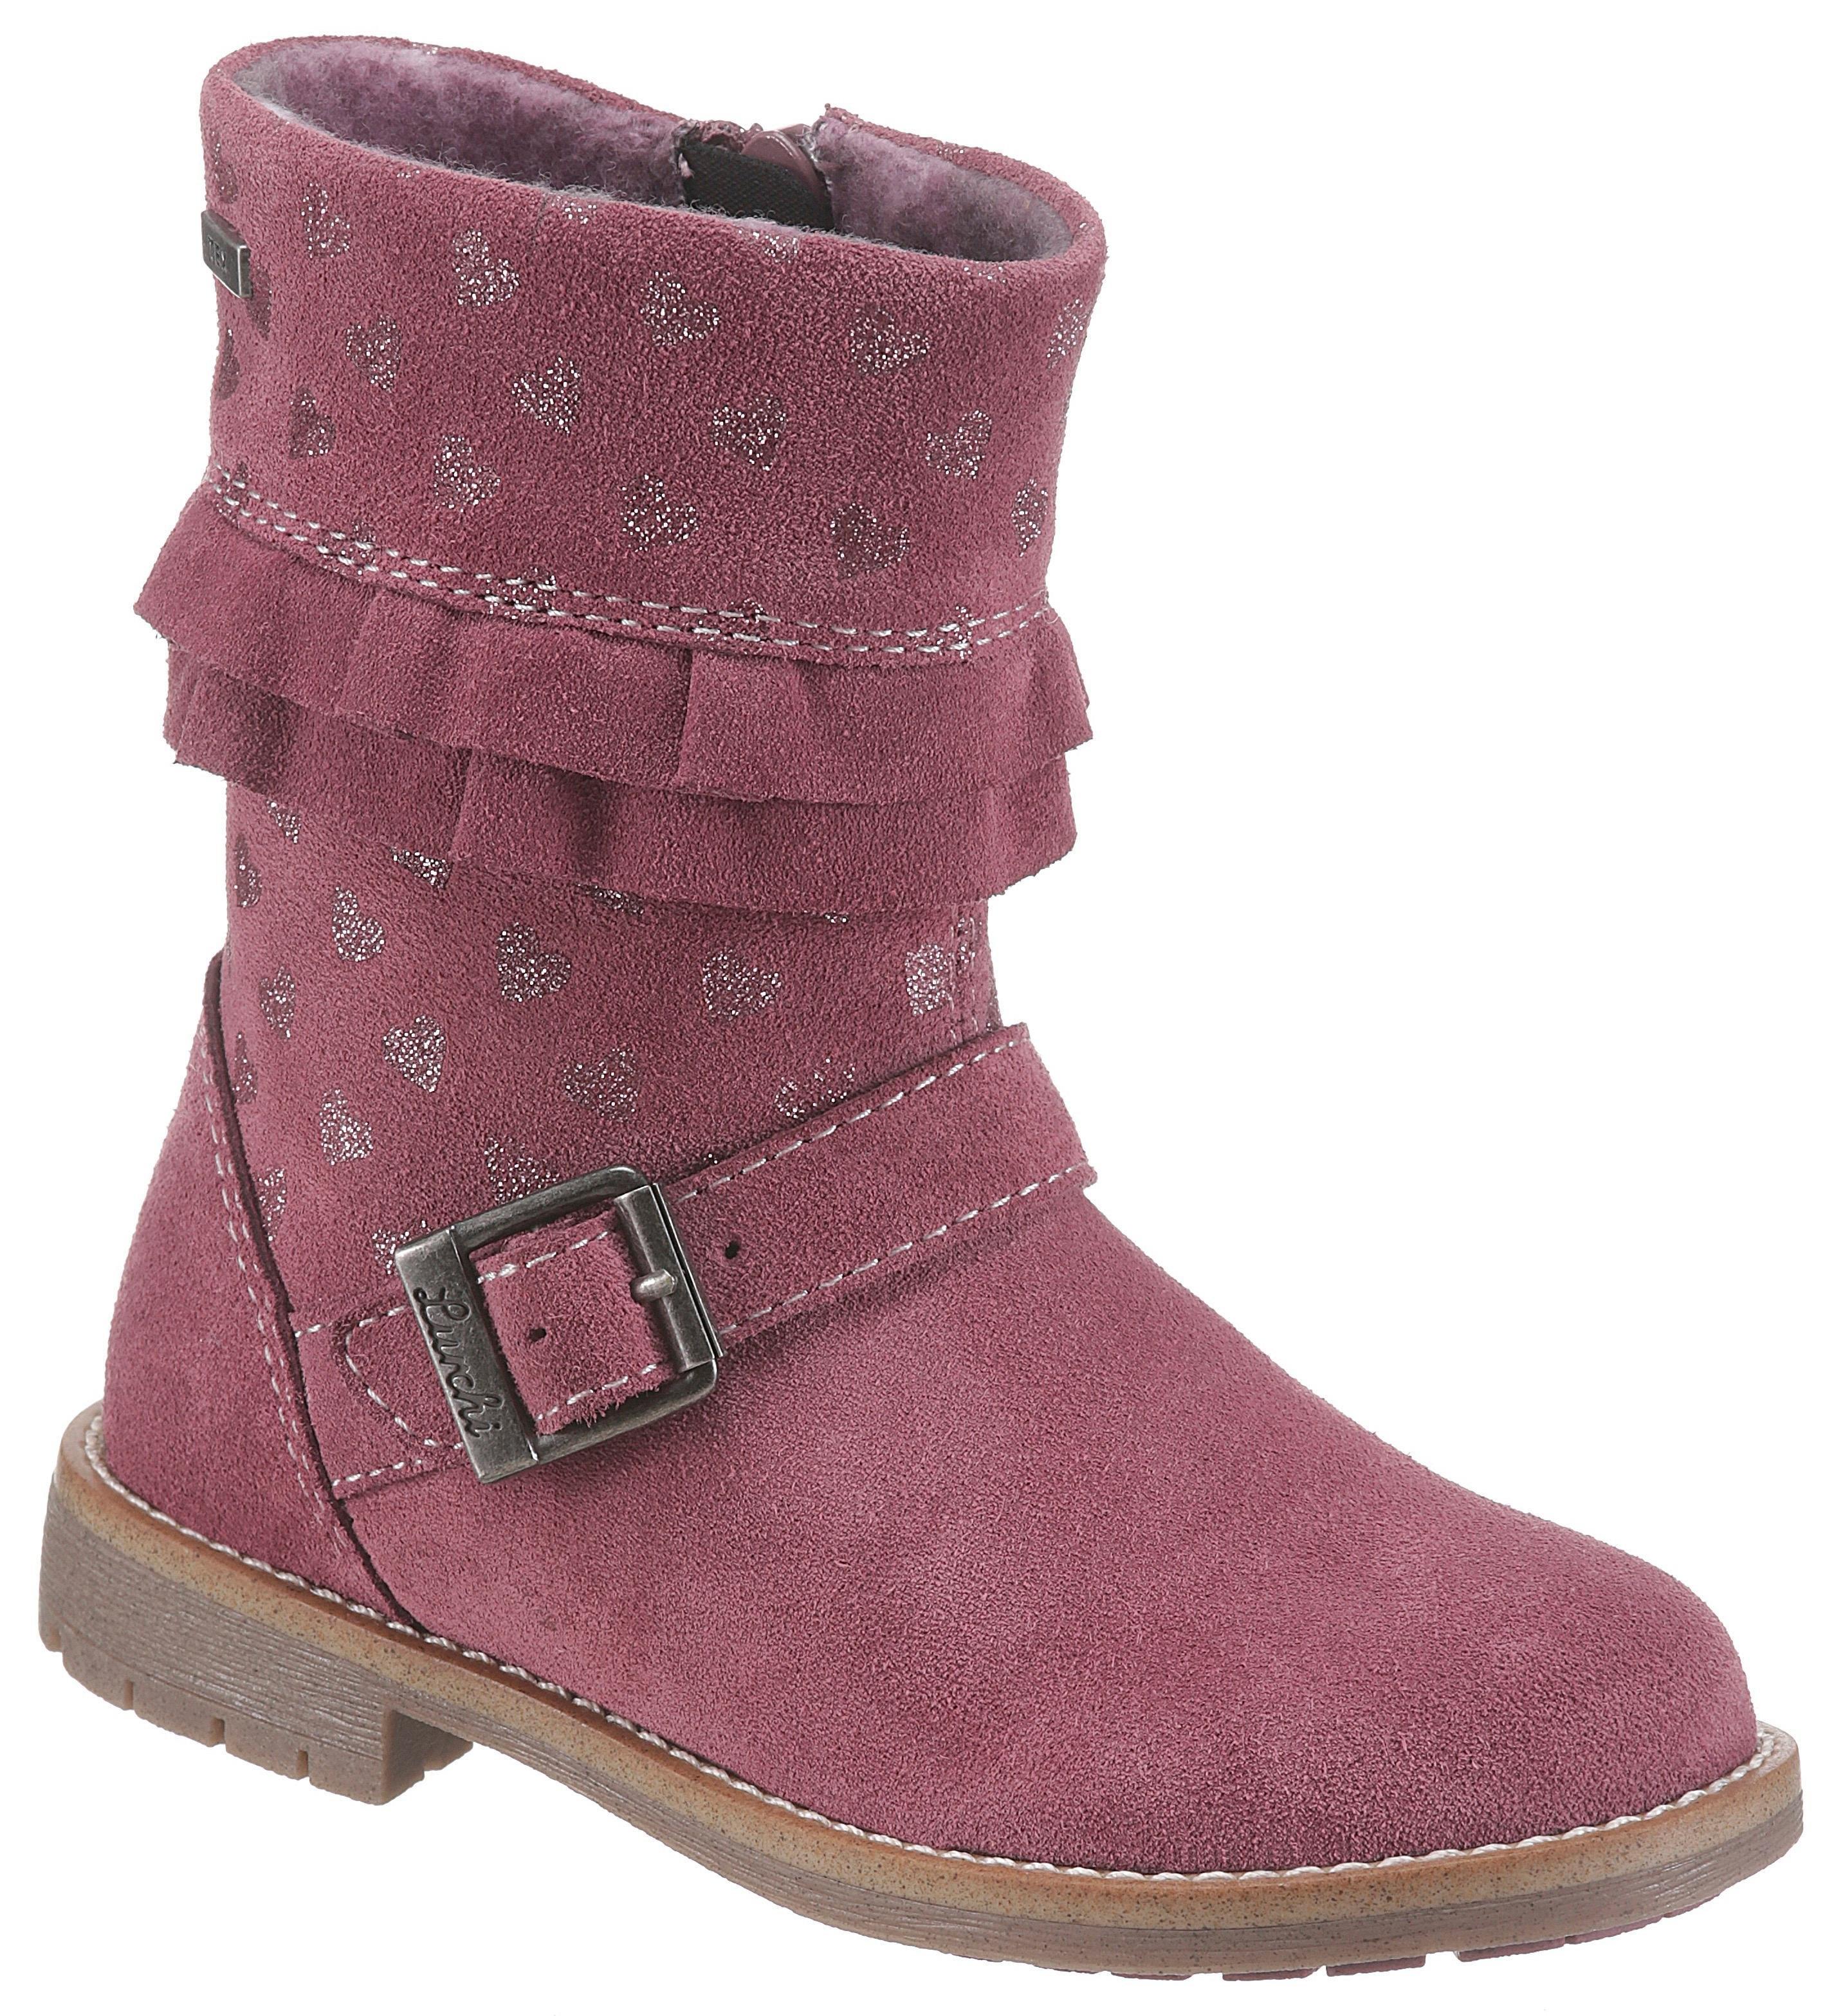 Lurchi winterlaarsjes »Fiara-Tex« nu online kopen bij OTTO